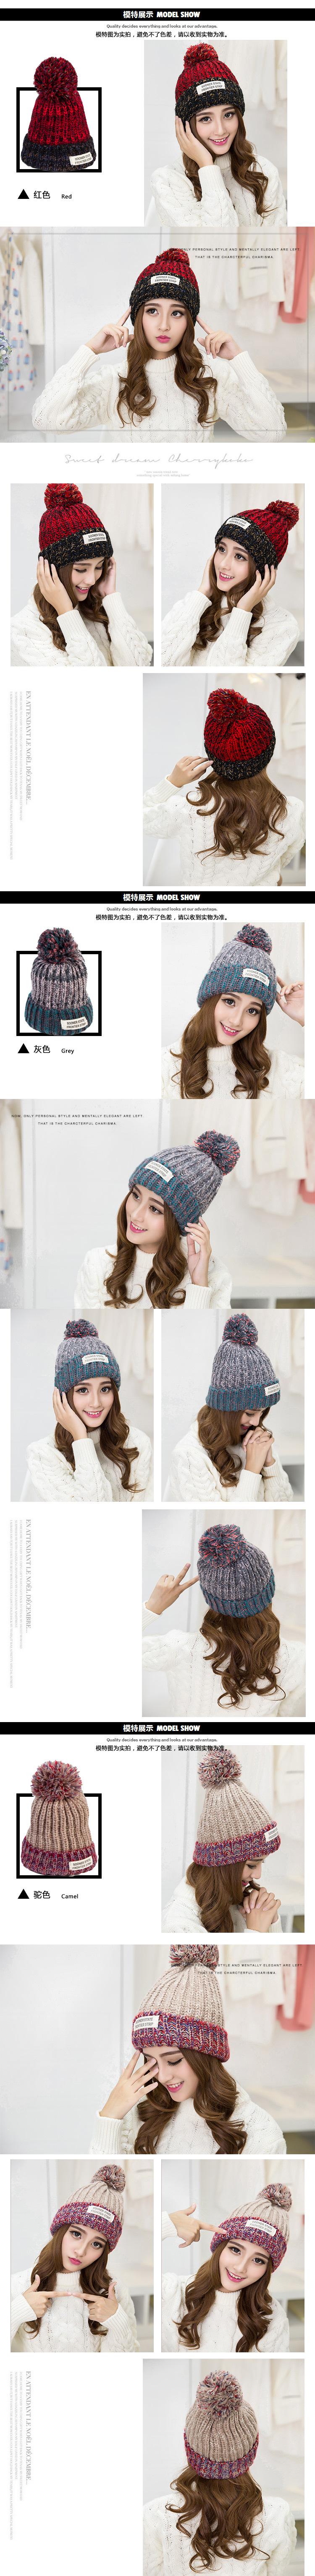 Kesebi 2017 New Hot Fashion Women Koream Winter Labeling Patchwork Caps Hats Female Thick Warm Knitting Casual Skullies Beanies